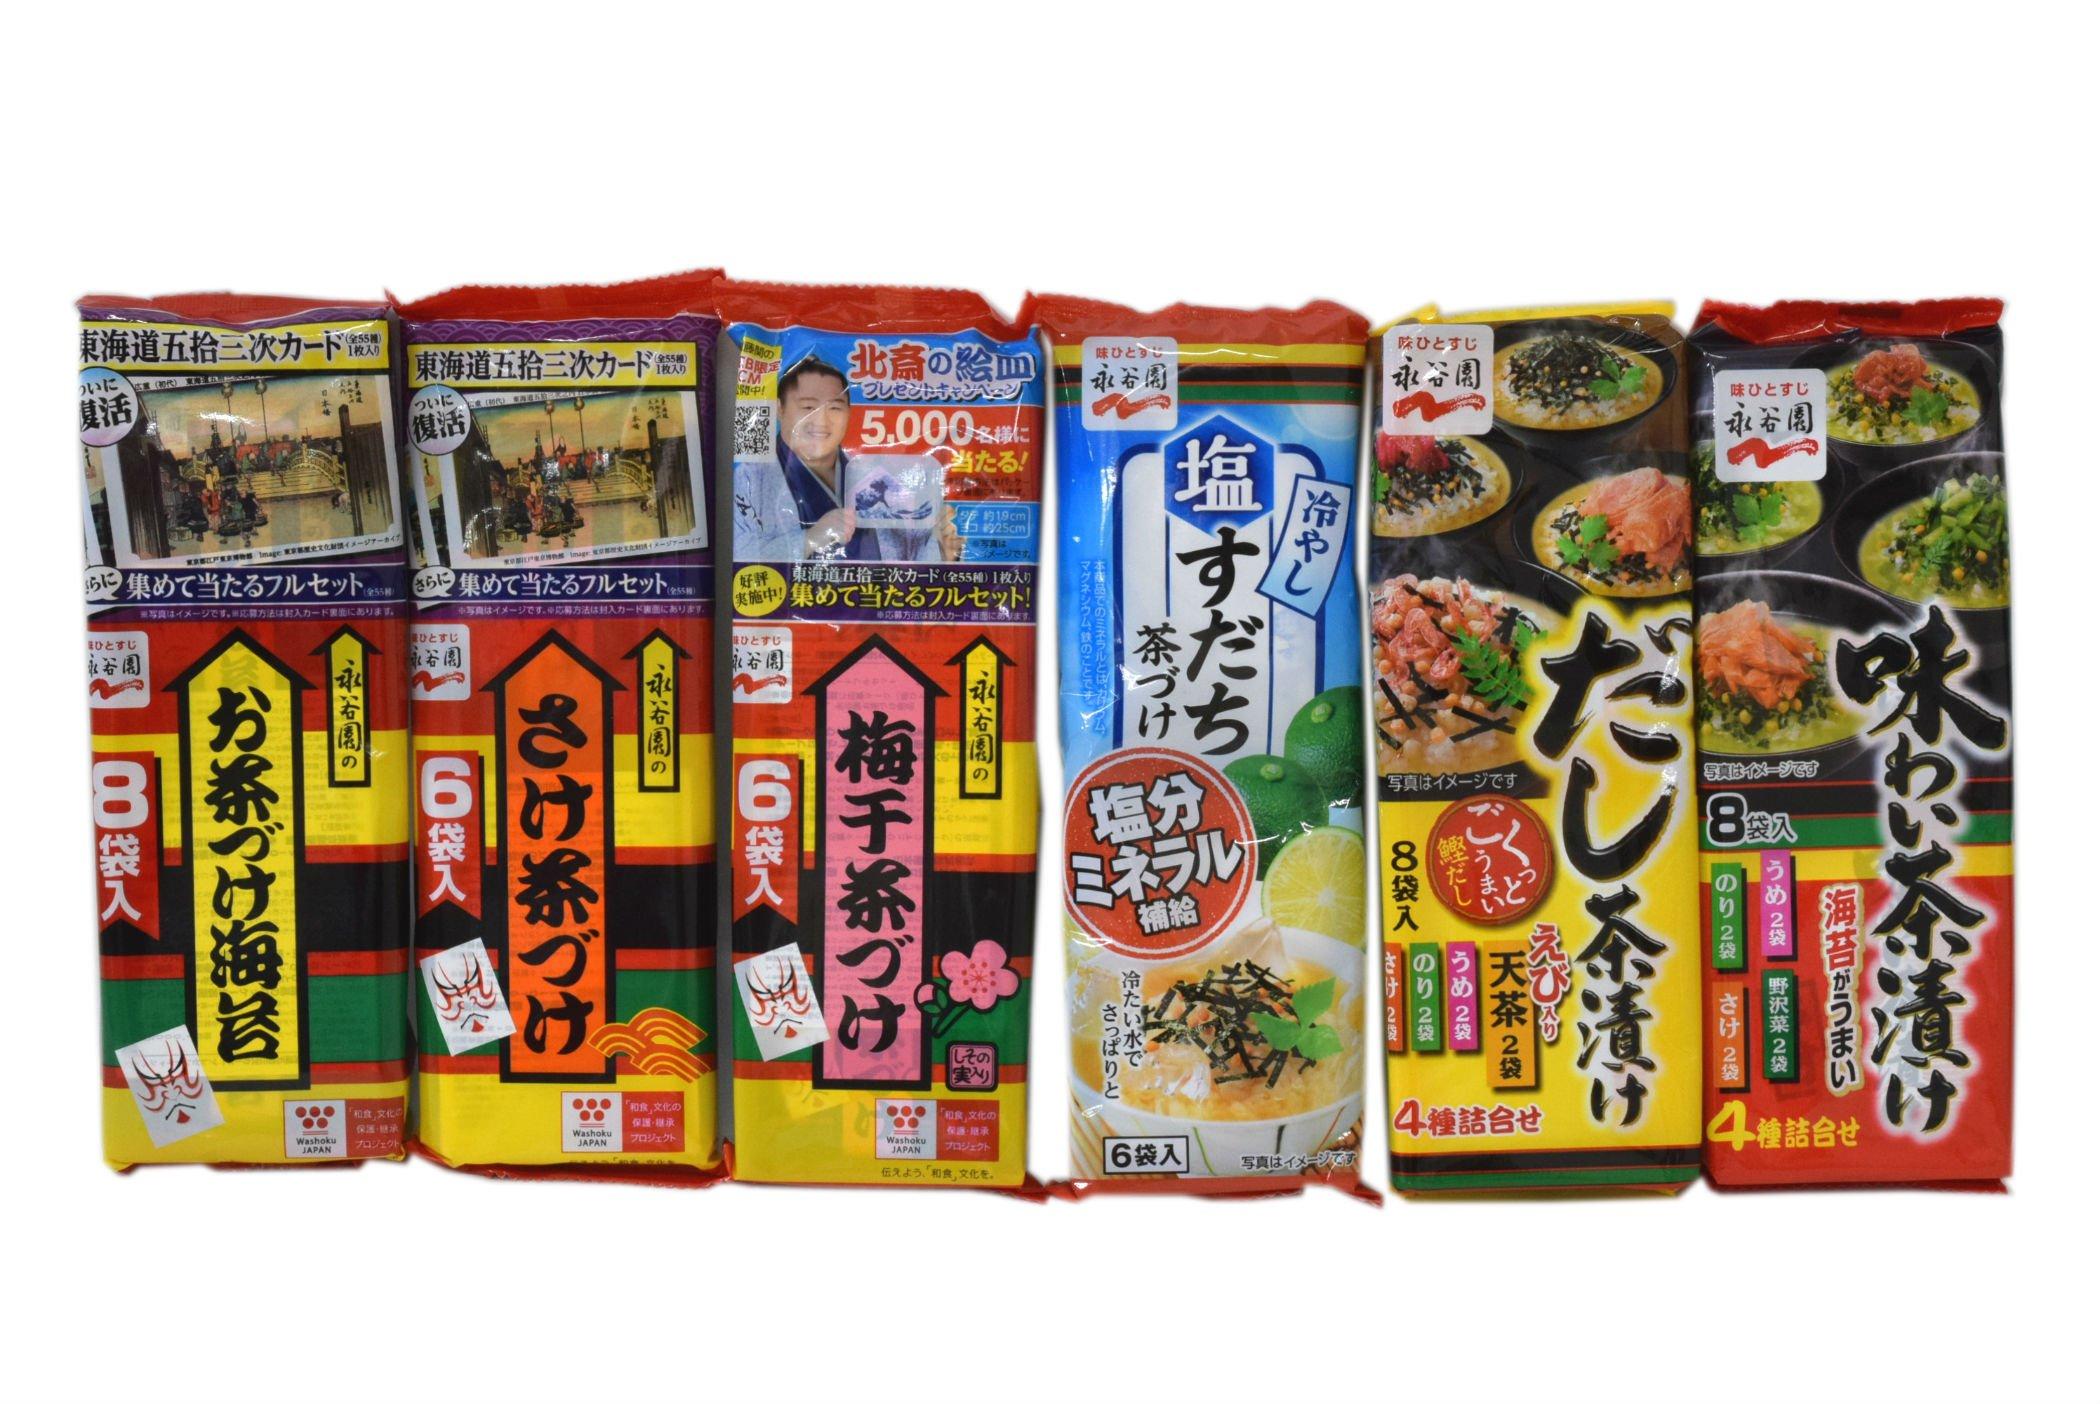 Japanese chazuke Variety set. Nori, sake, umeboshi etc. No.a007